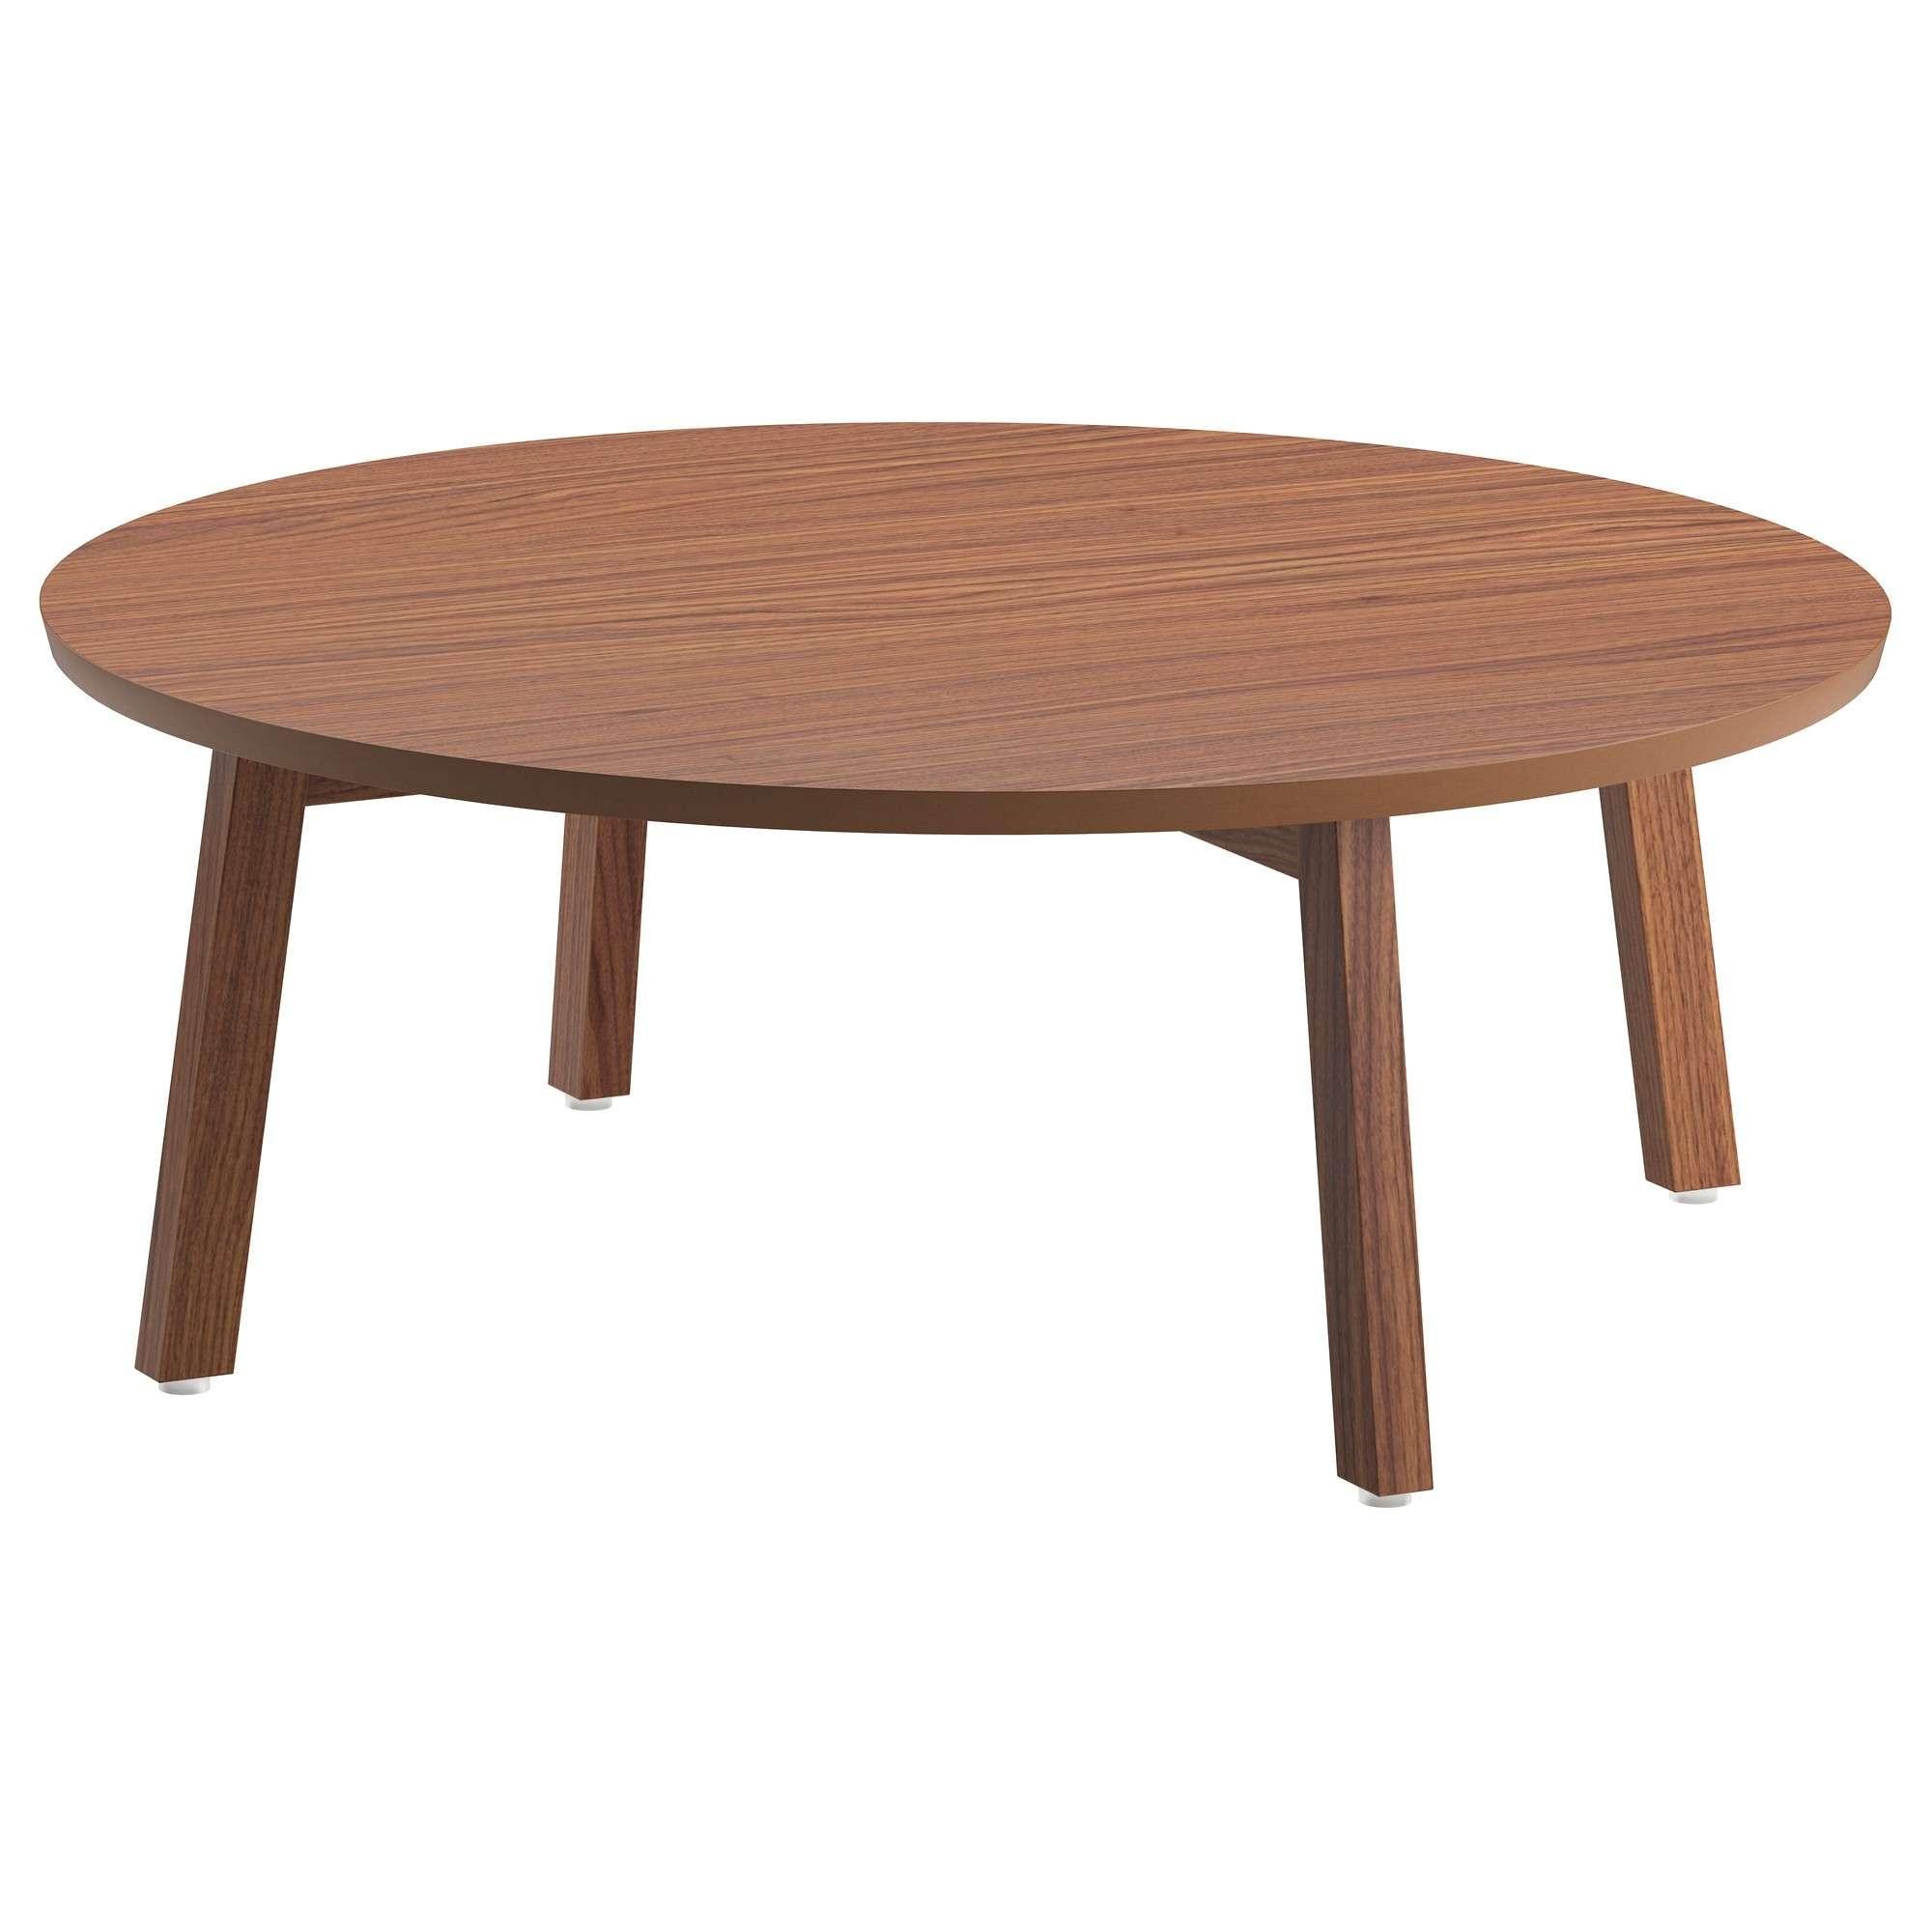 Coffee Table Stockholm Coffee Table Walnut Veneer Cm Ikea Art With In Well Known Oak Veneer Coffee Tables (View 20 of 20)